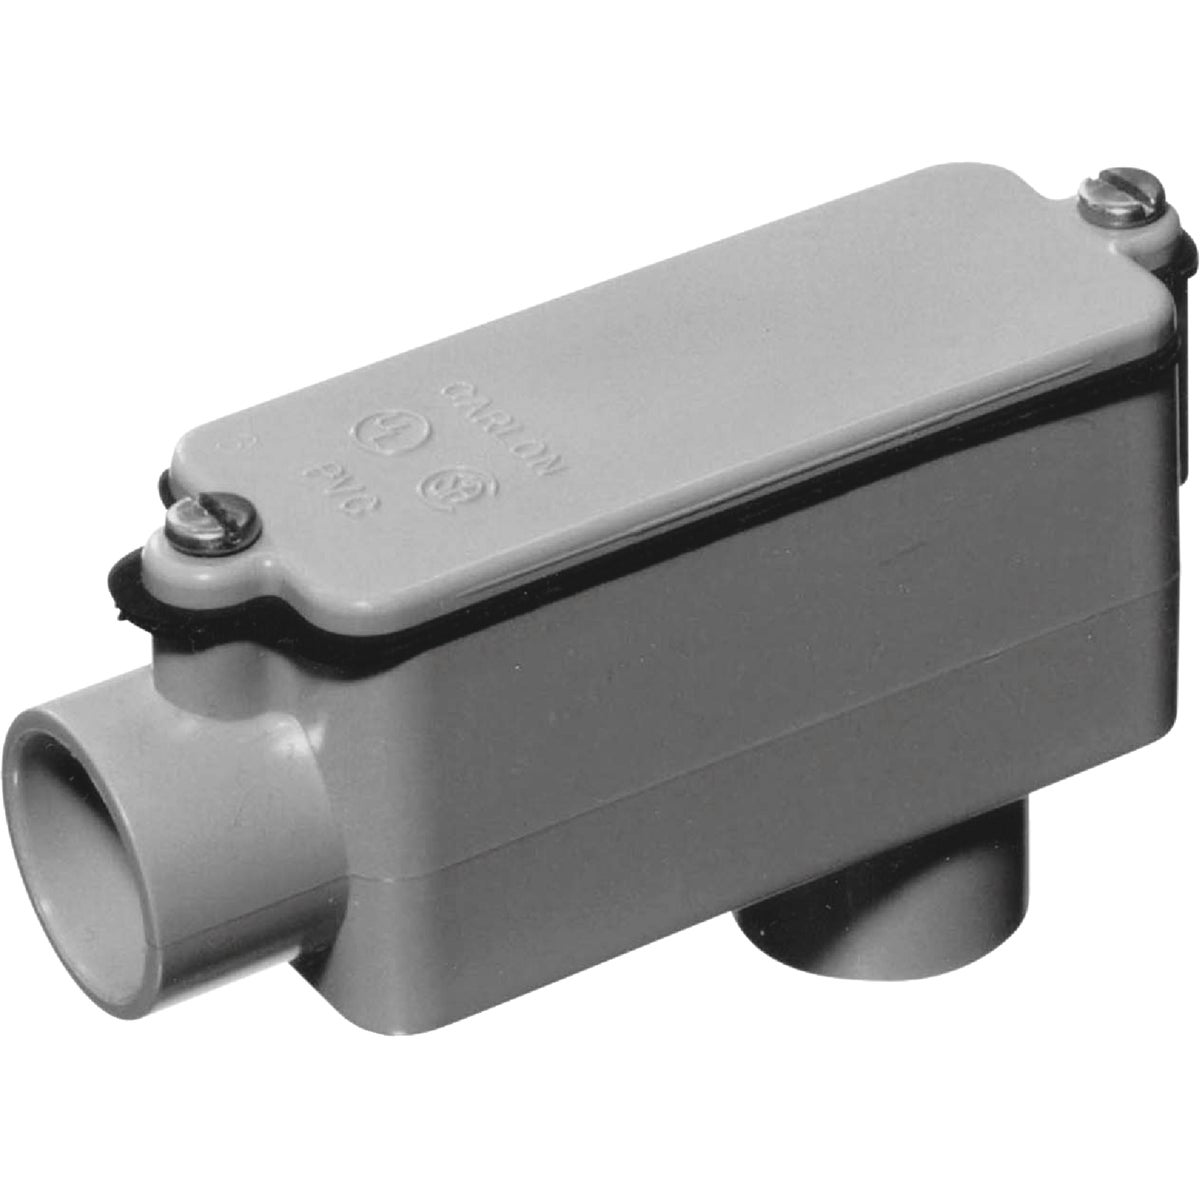 "Cantex Industries #5133666U 1-1/4"" LB AccessFitting"